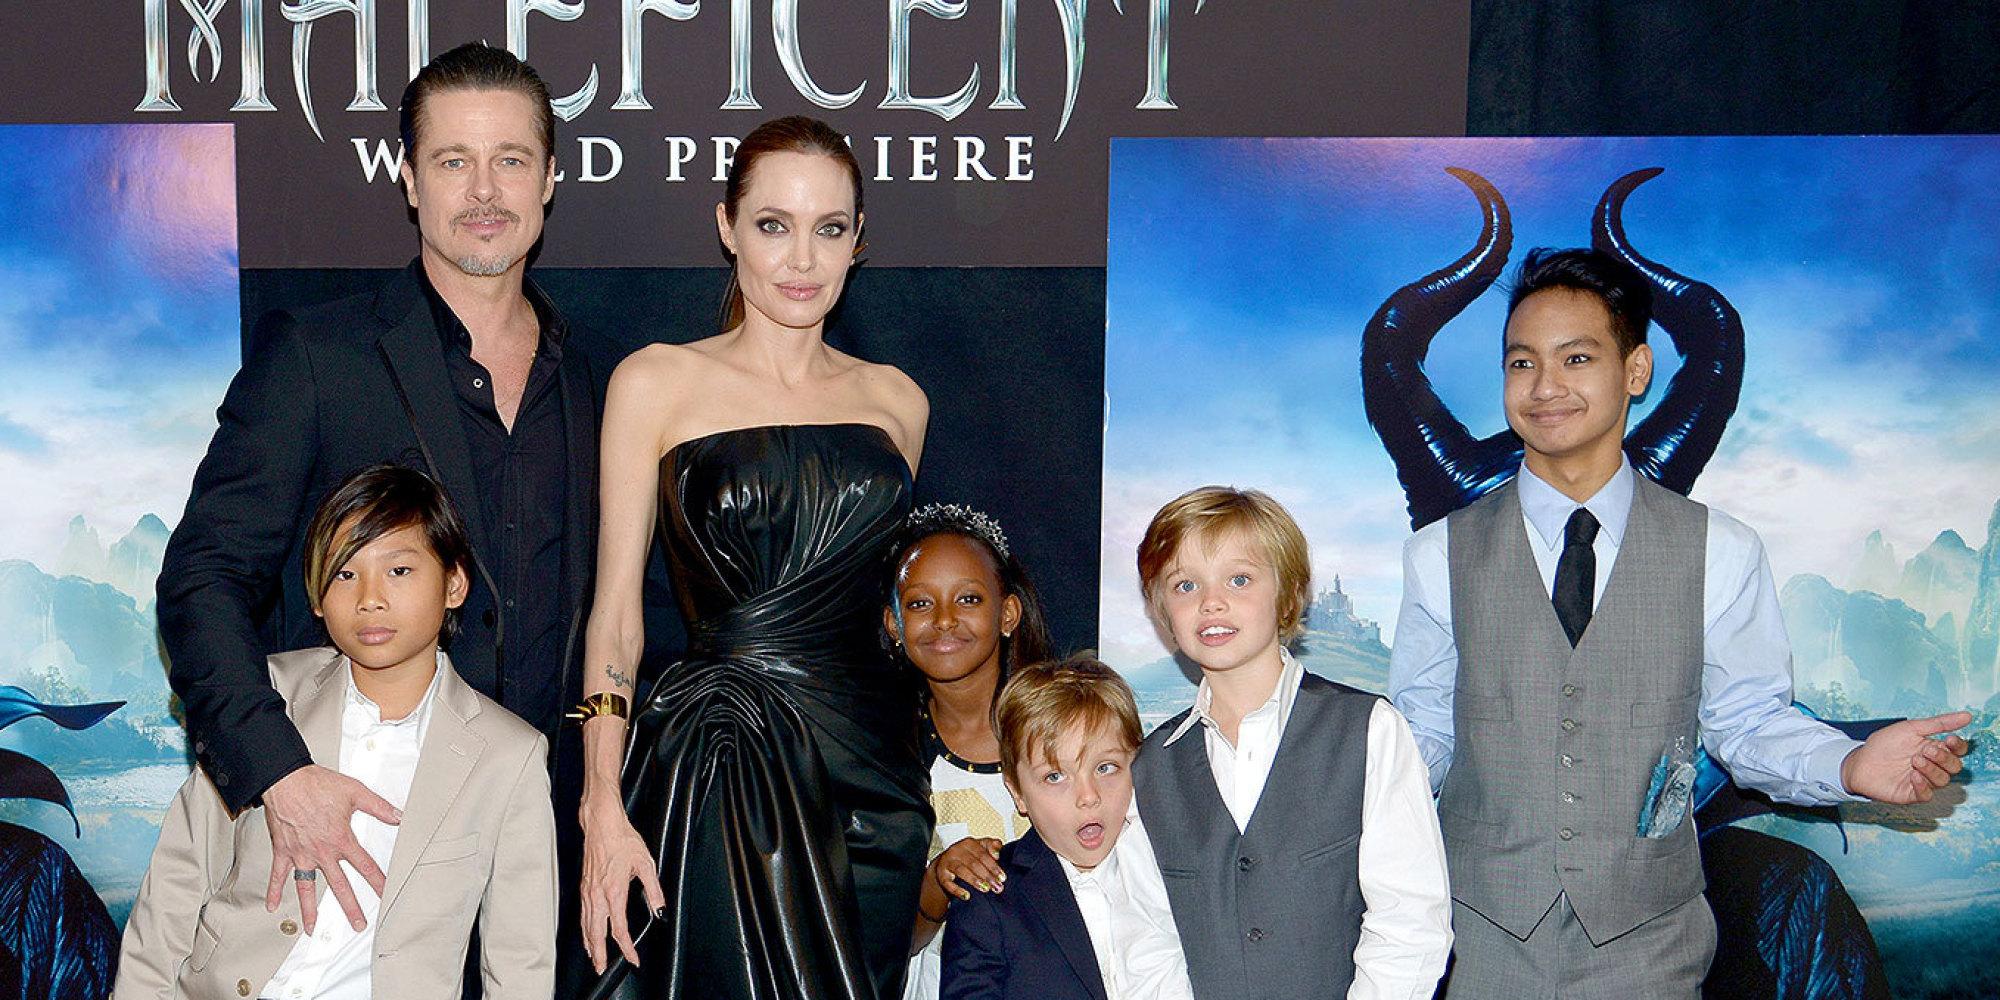 Brad Pitt And Angelina Jolie's Kids Walk The Red Carpet At ...  Brad Pitt And A...